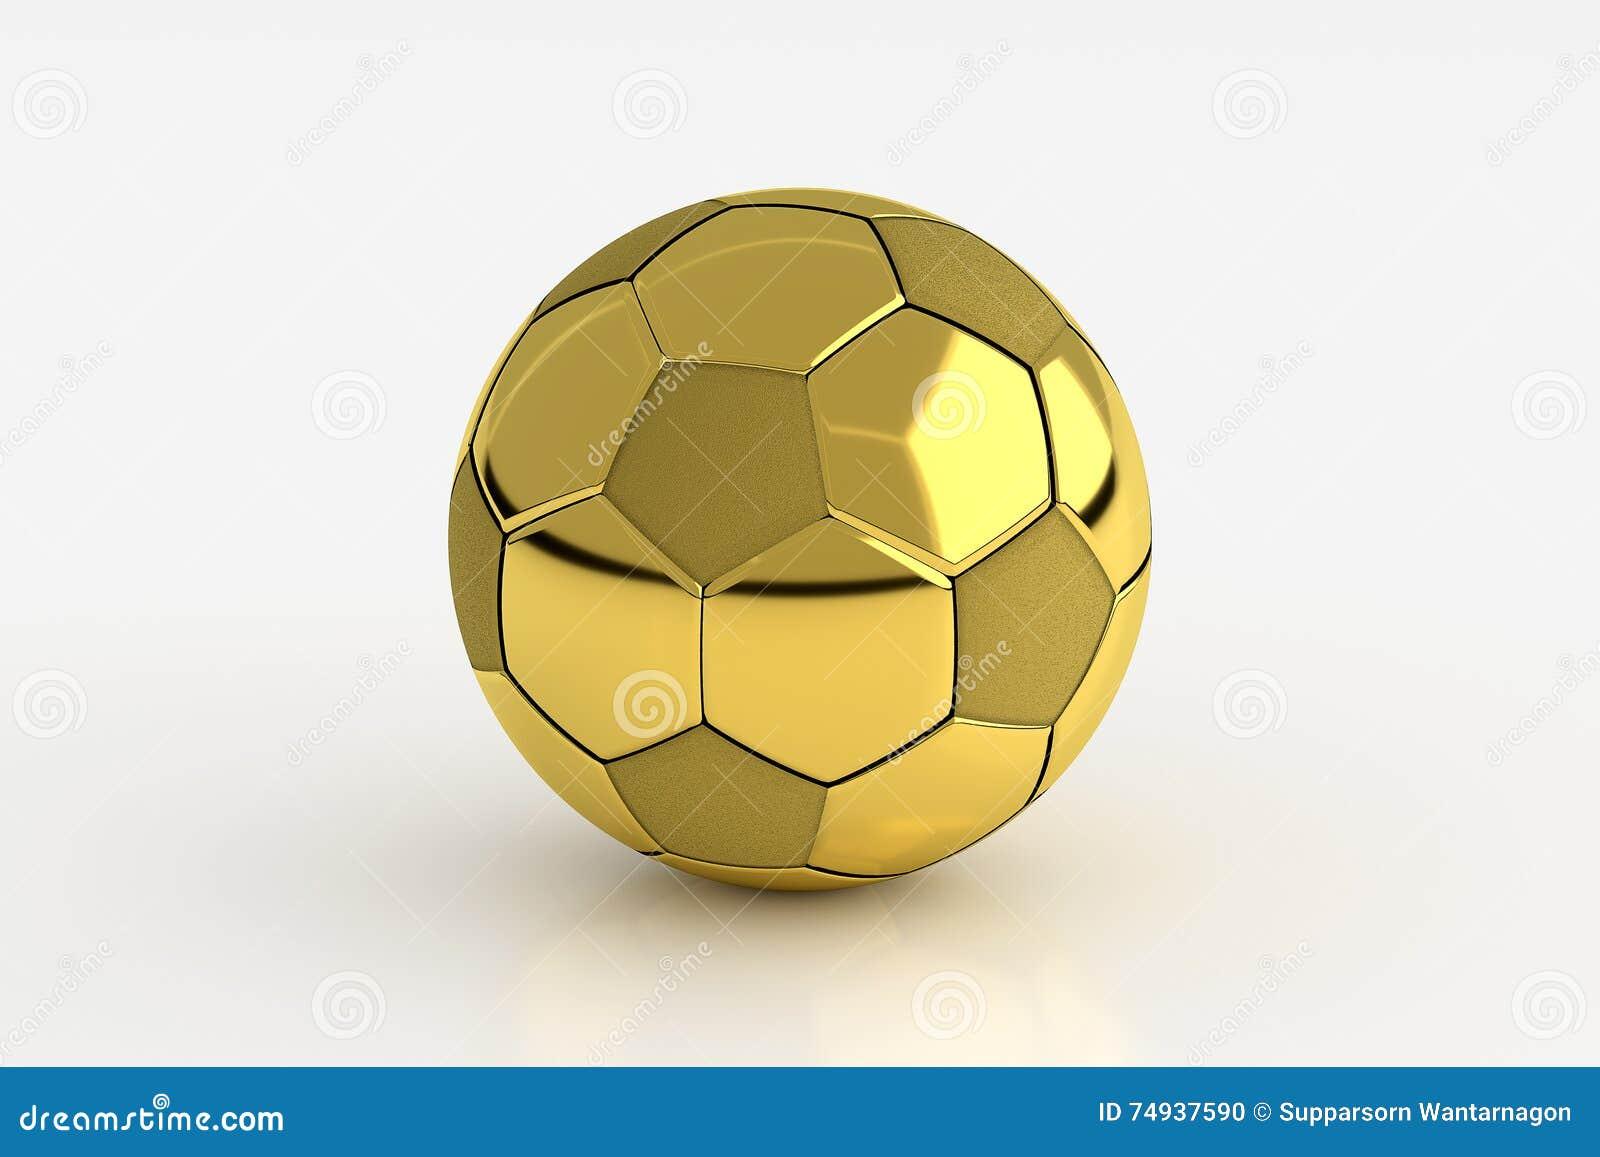 feea3fd85 3D rendering of golden soccer ball isolated on white background. More  similar stock illustrations